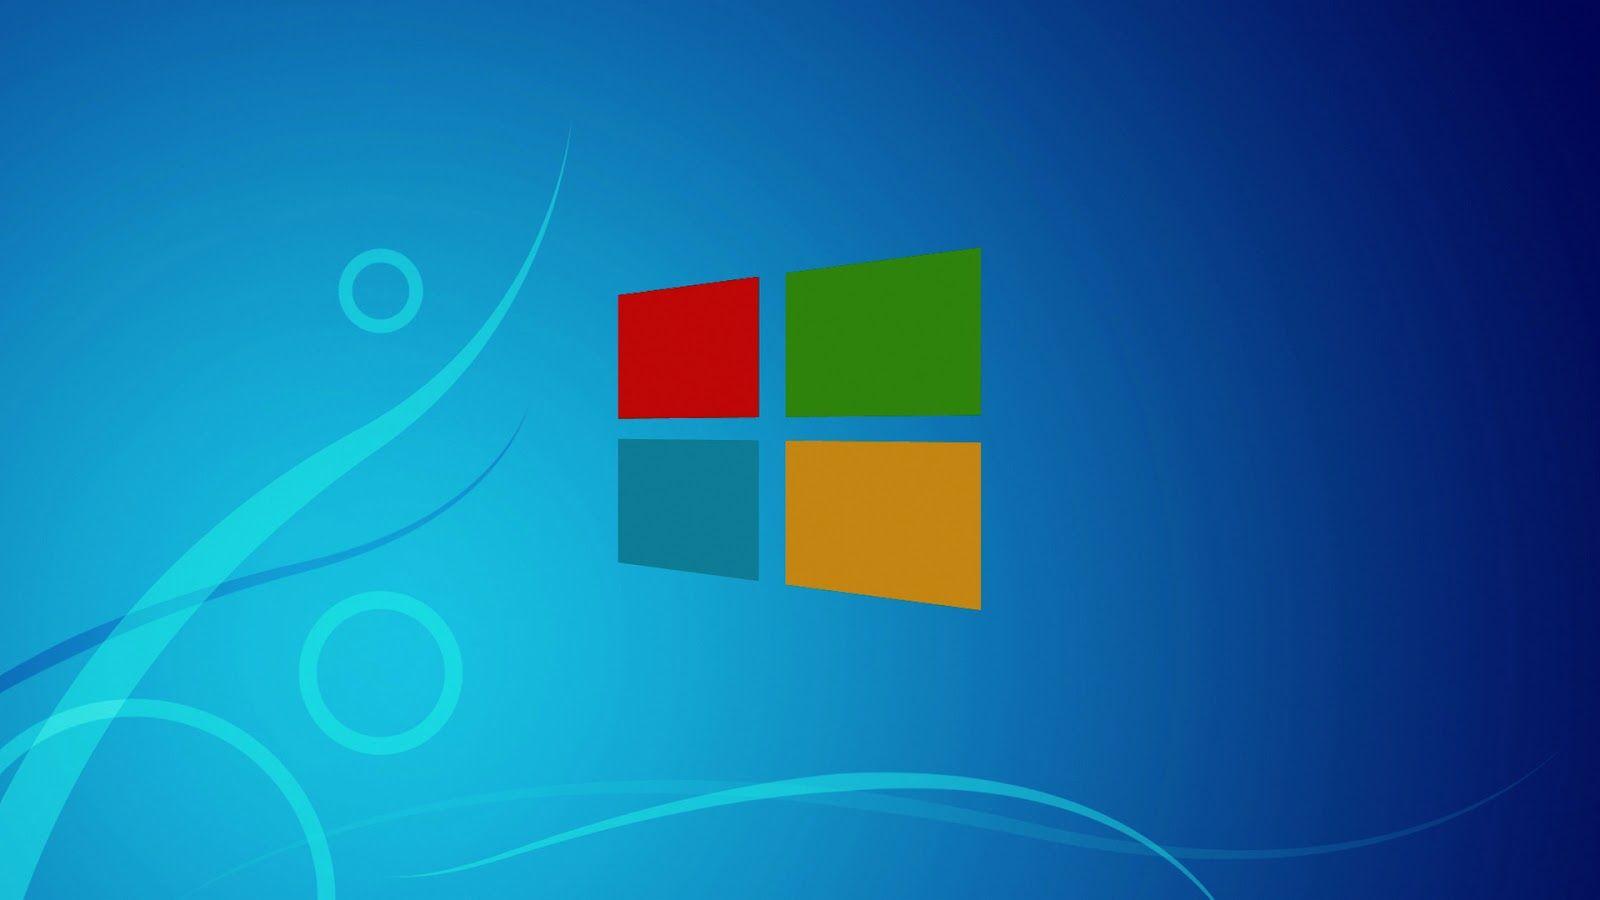 Windows Hero K Hd Desktop Wallpaper Widescreen Fullscreen